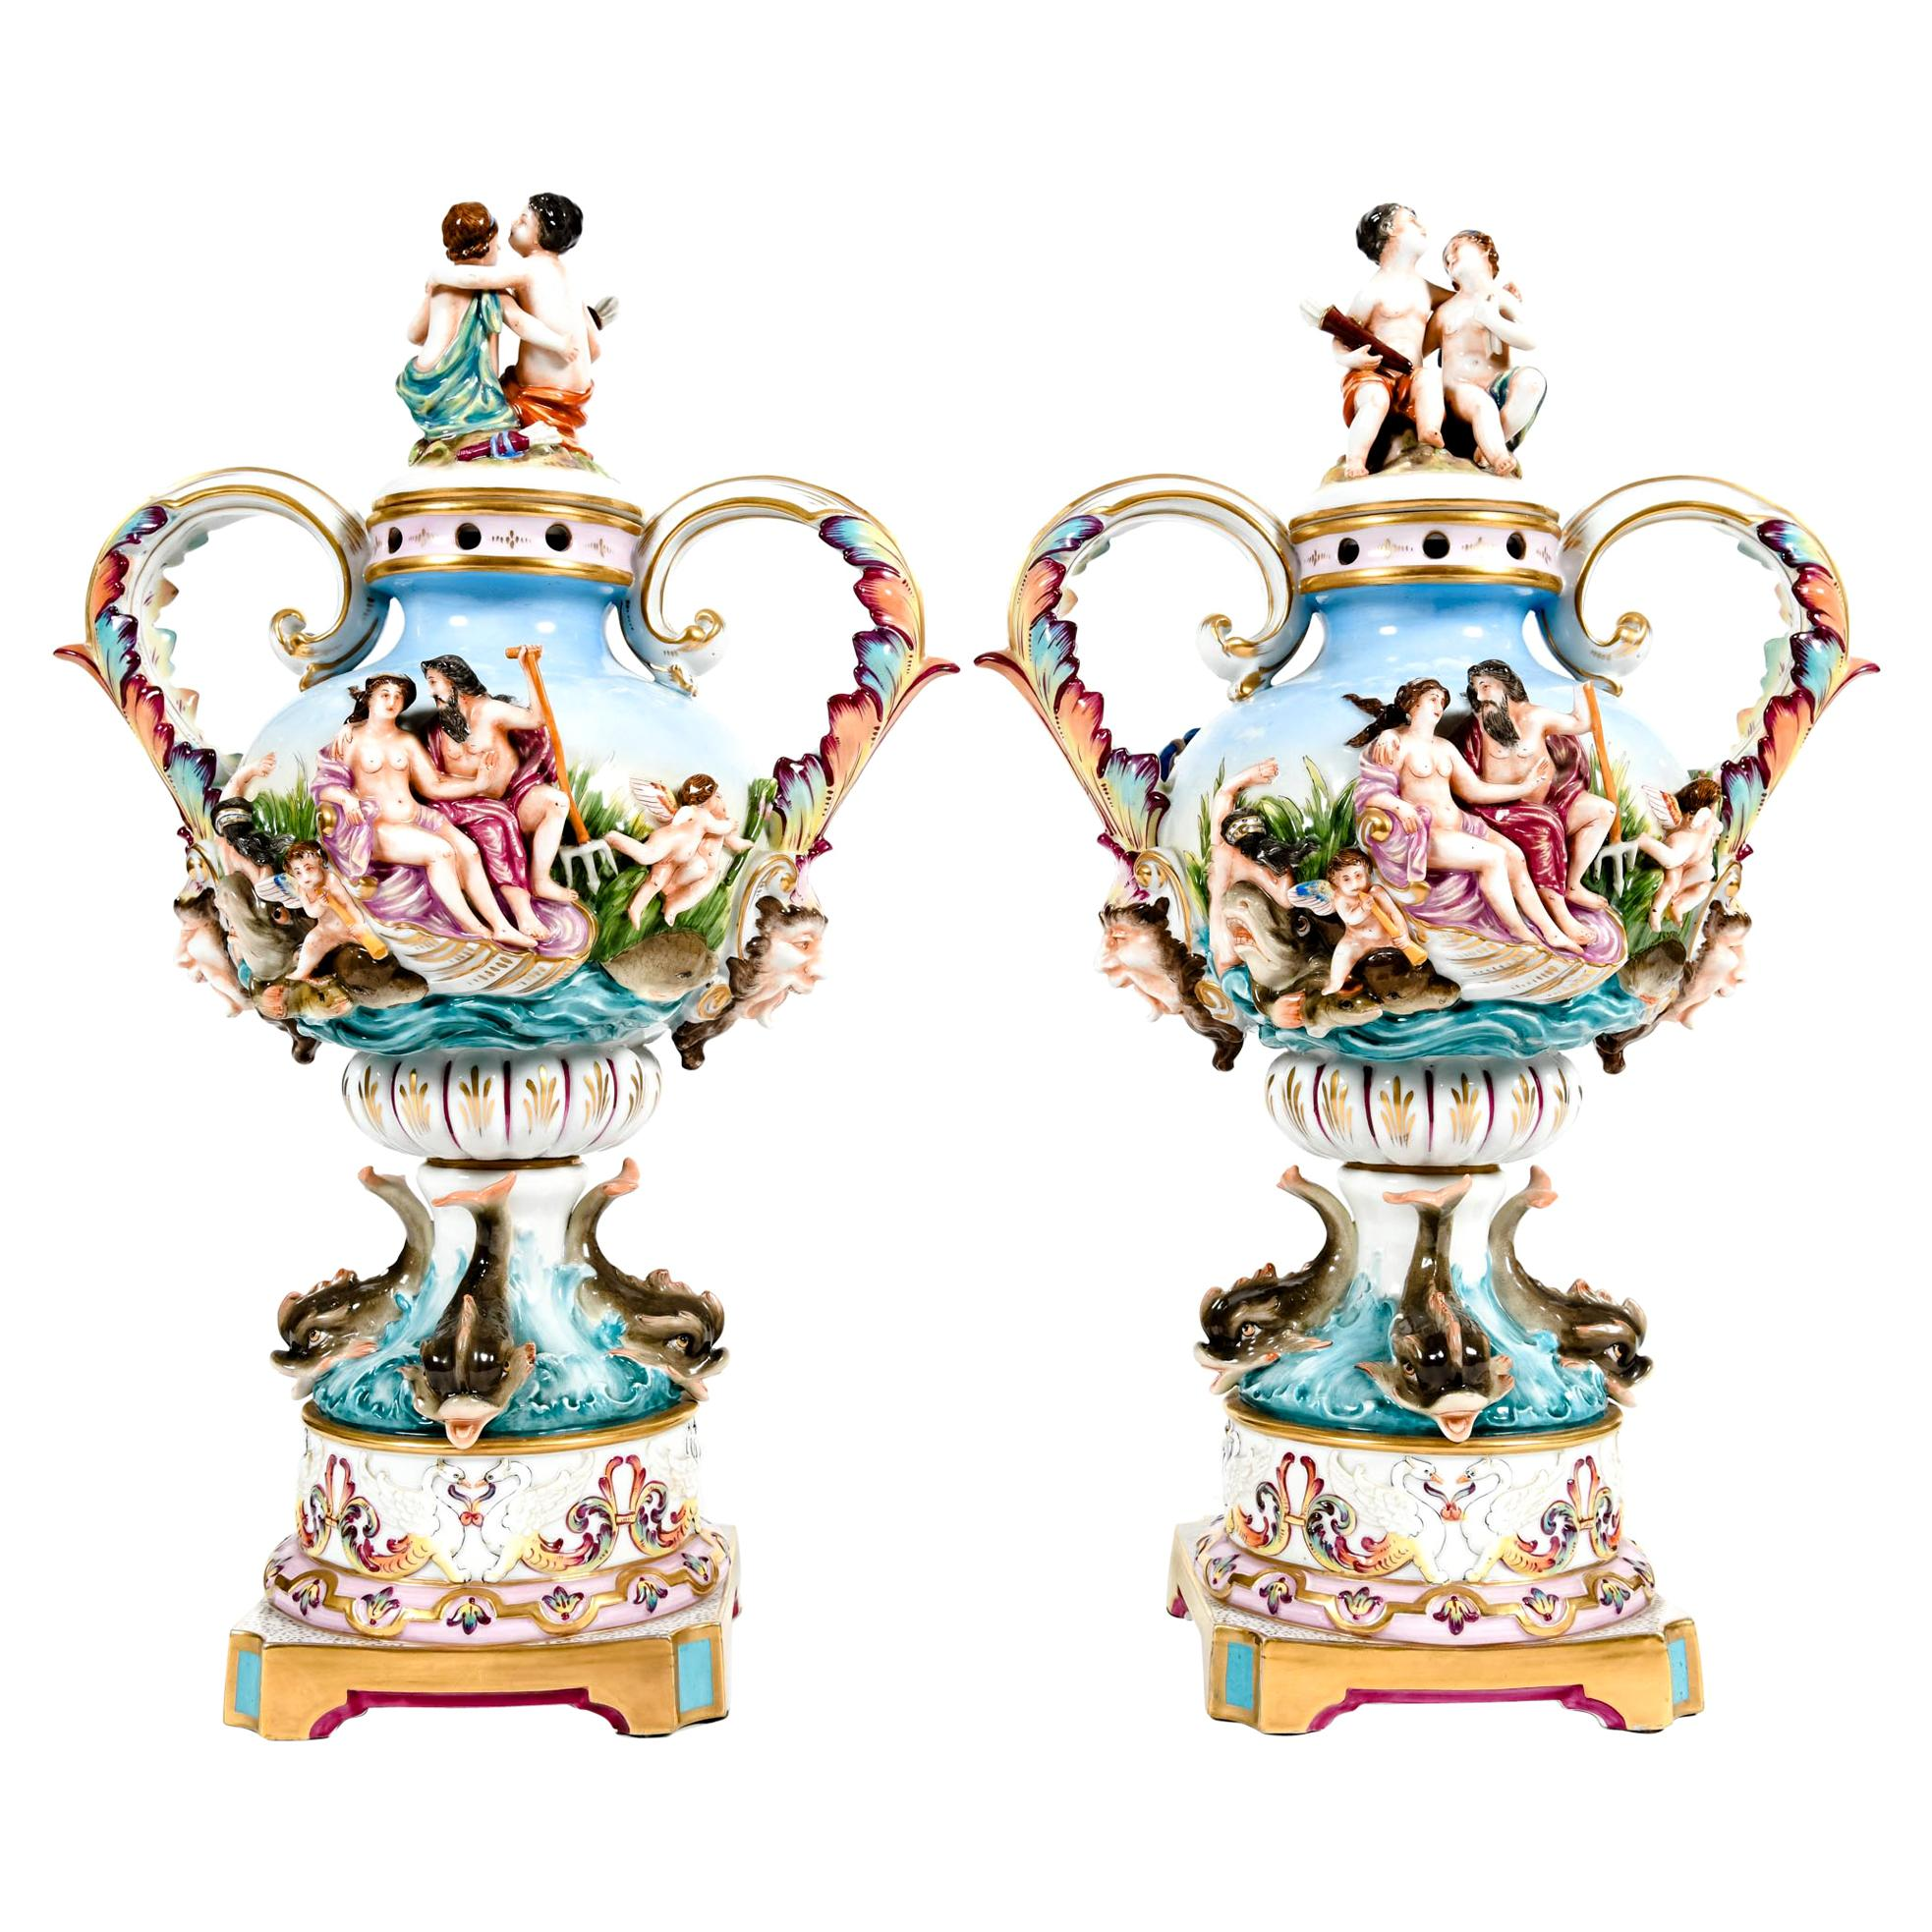 Pair Porcelain Covered Urns / Decorative Pieces